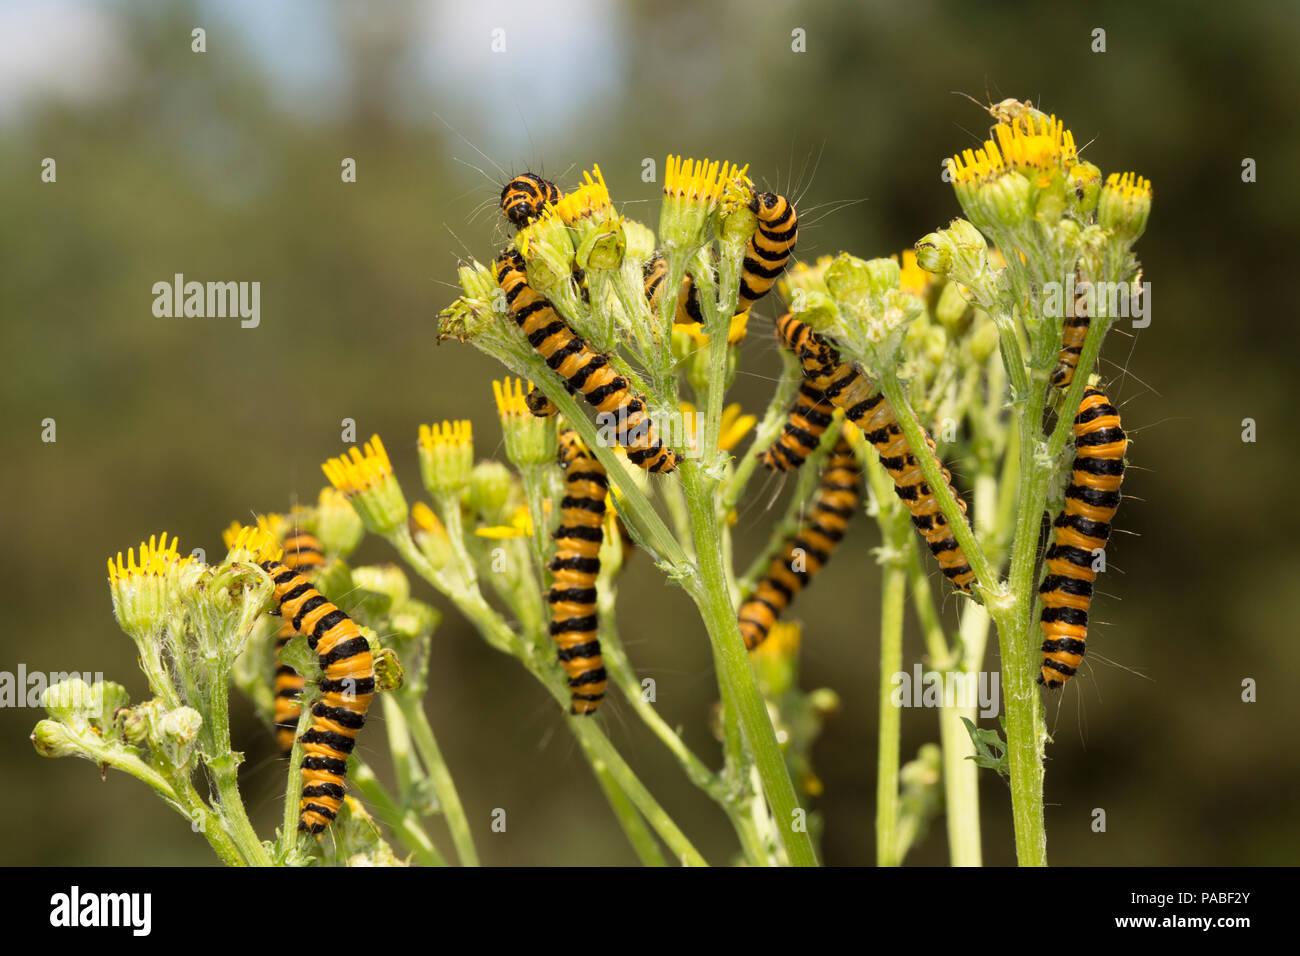 Cinnabar Moth Caterpillars Tyria Jacobaeae Feeding On